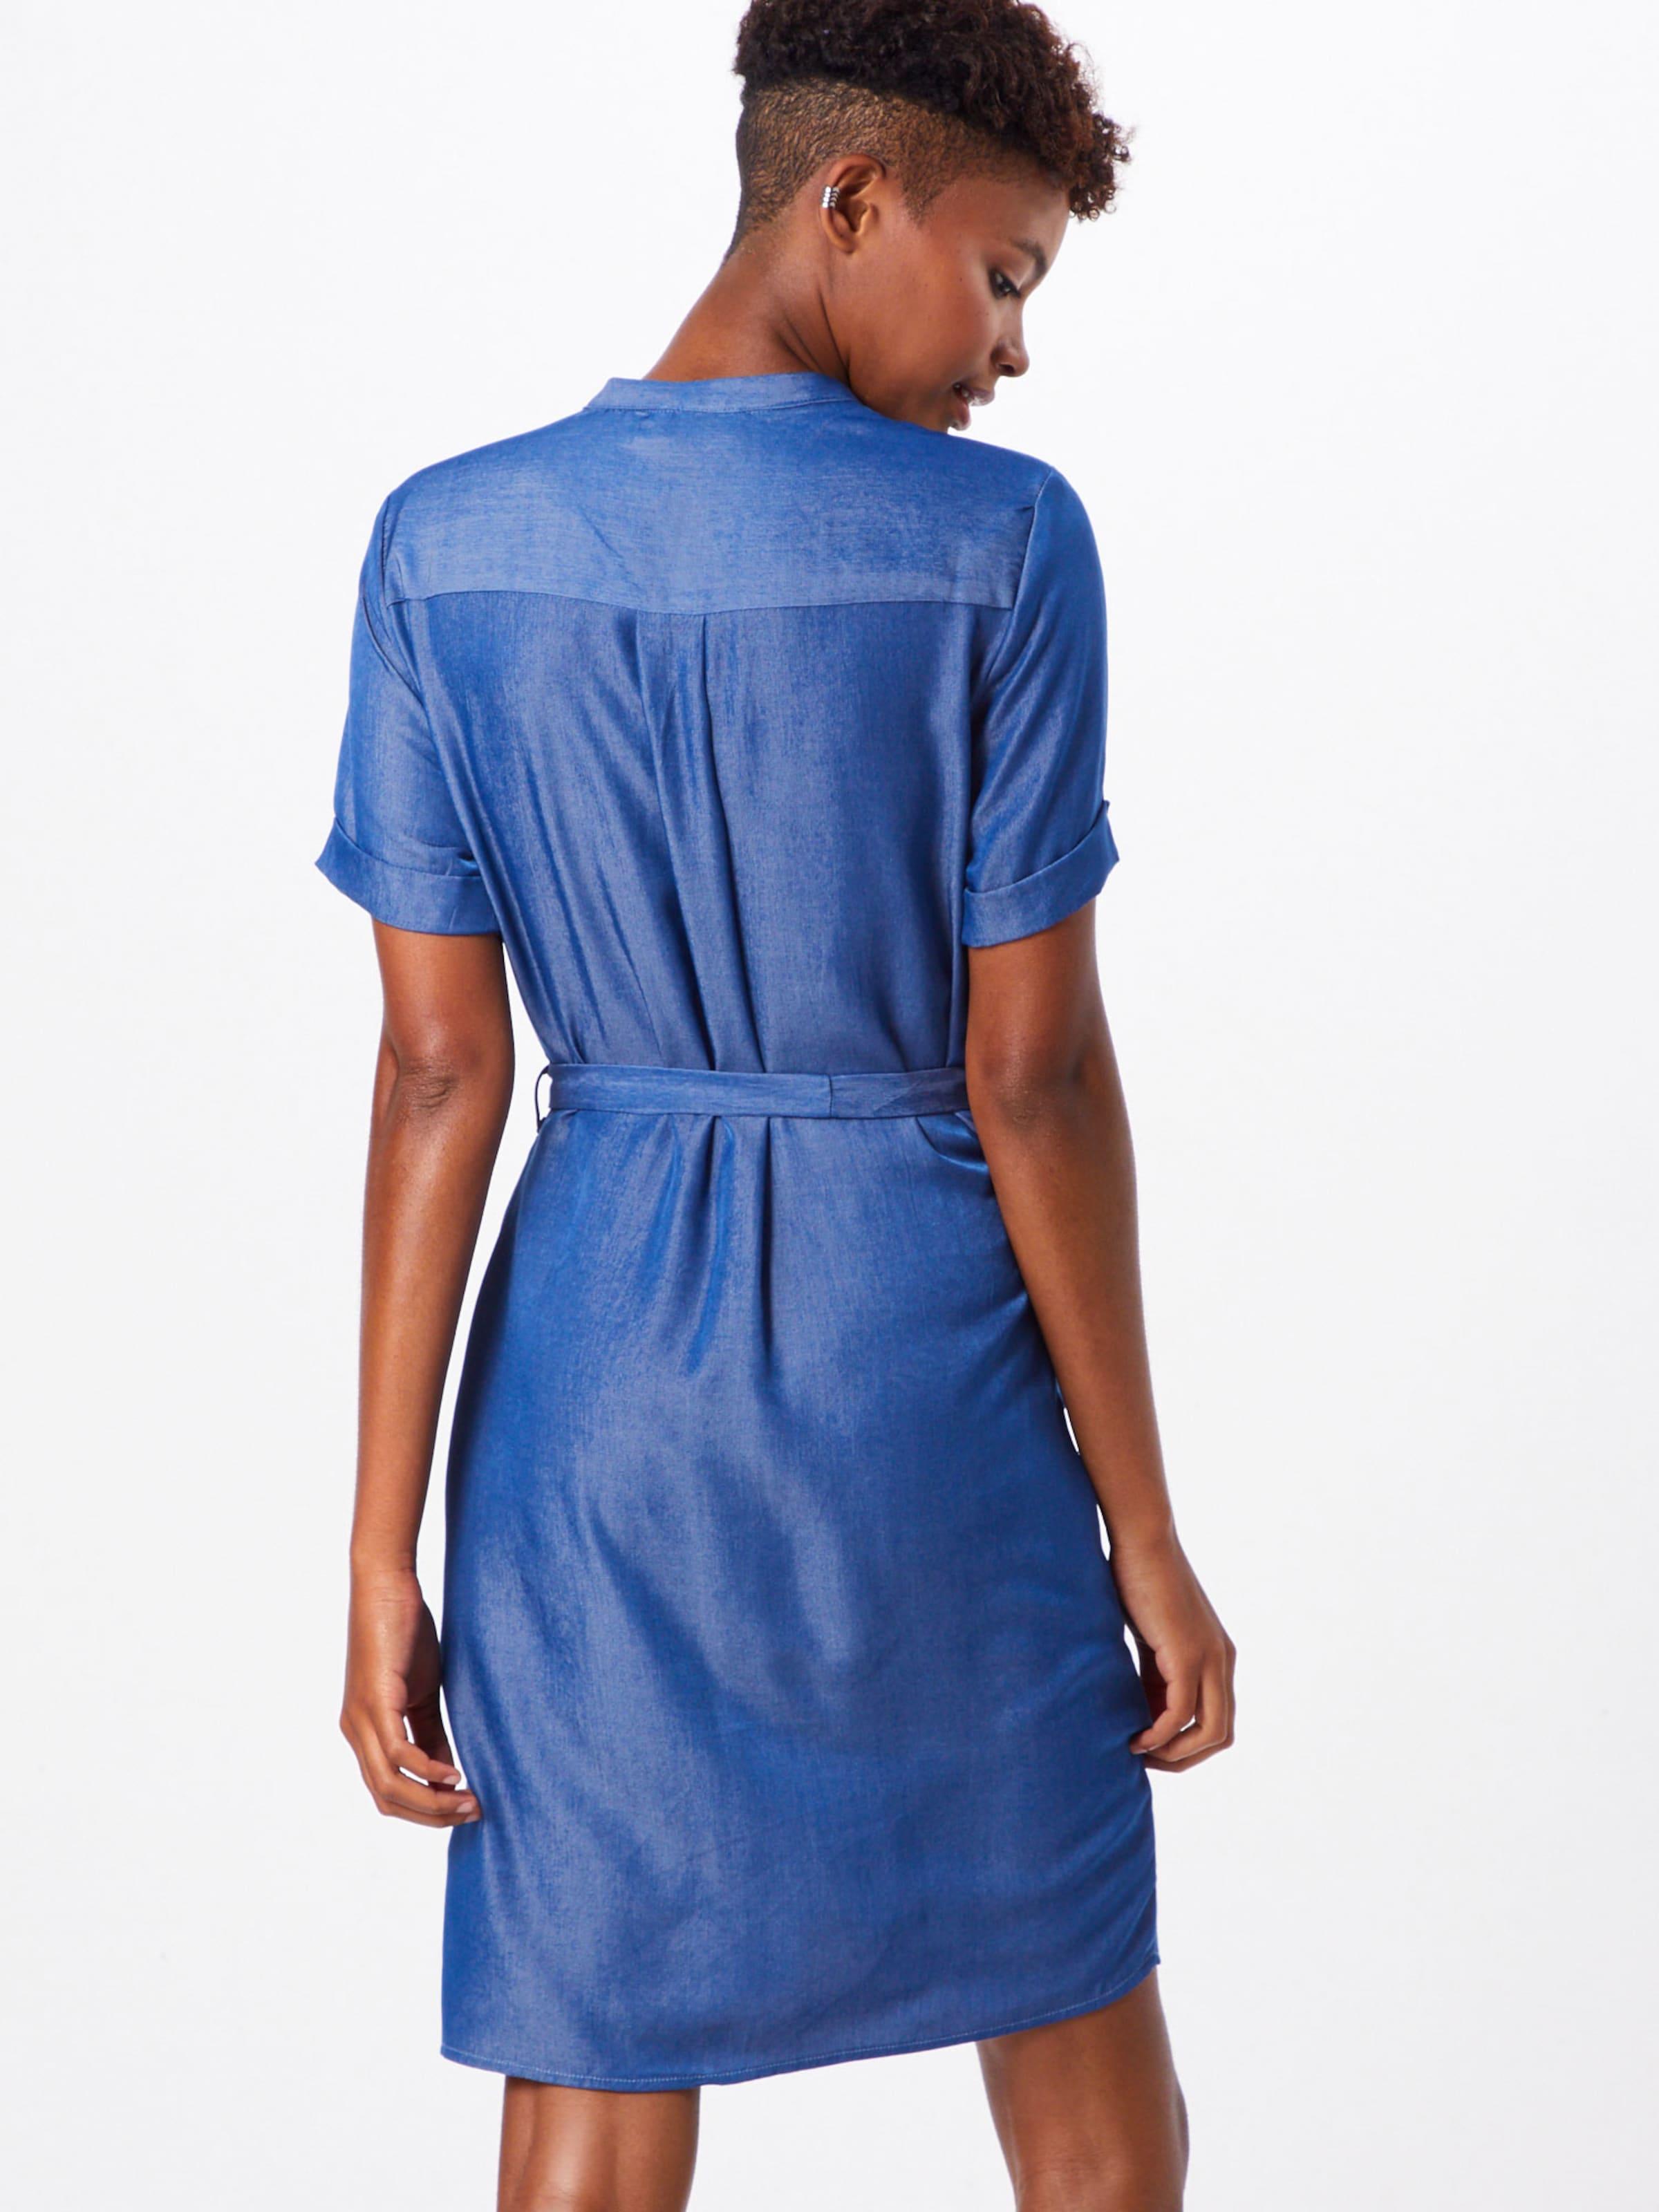 Robe dr Bleu Sisters Point 'valsi ss' En chemise 67gybvIYfm